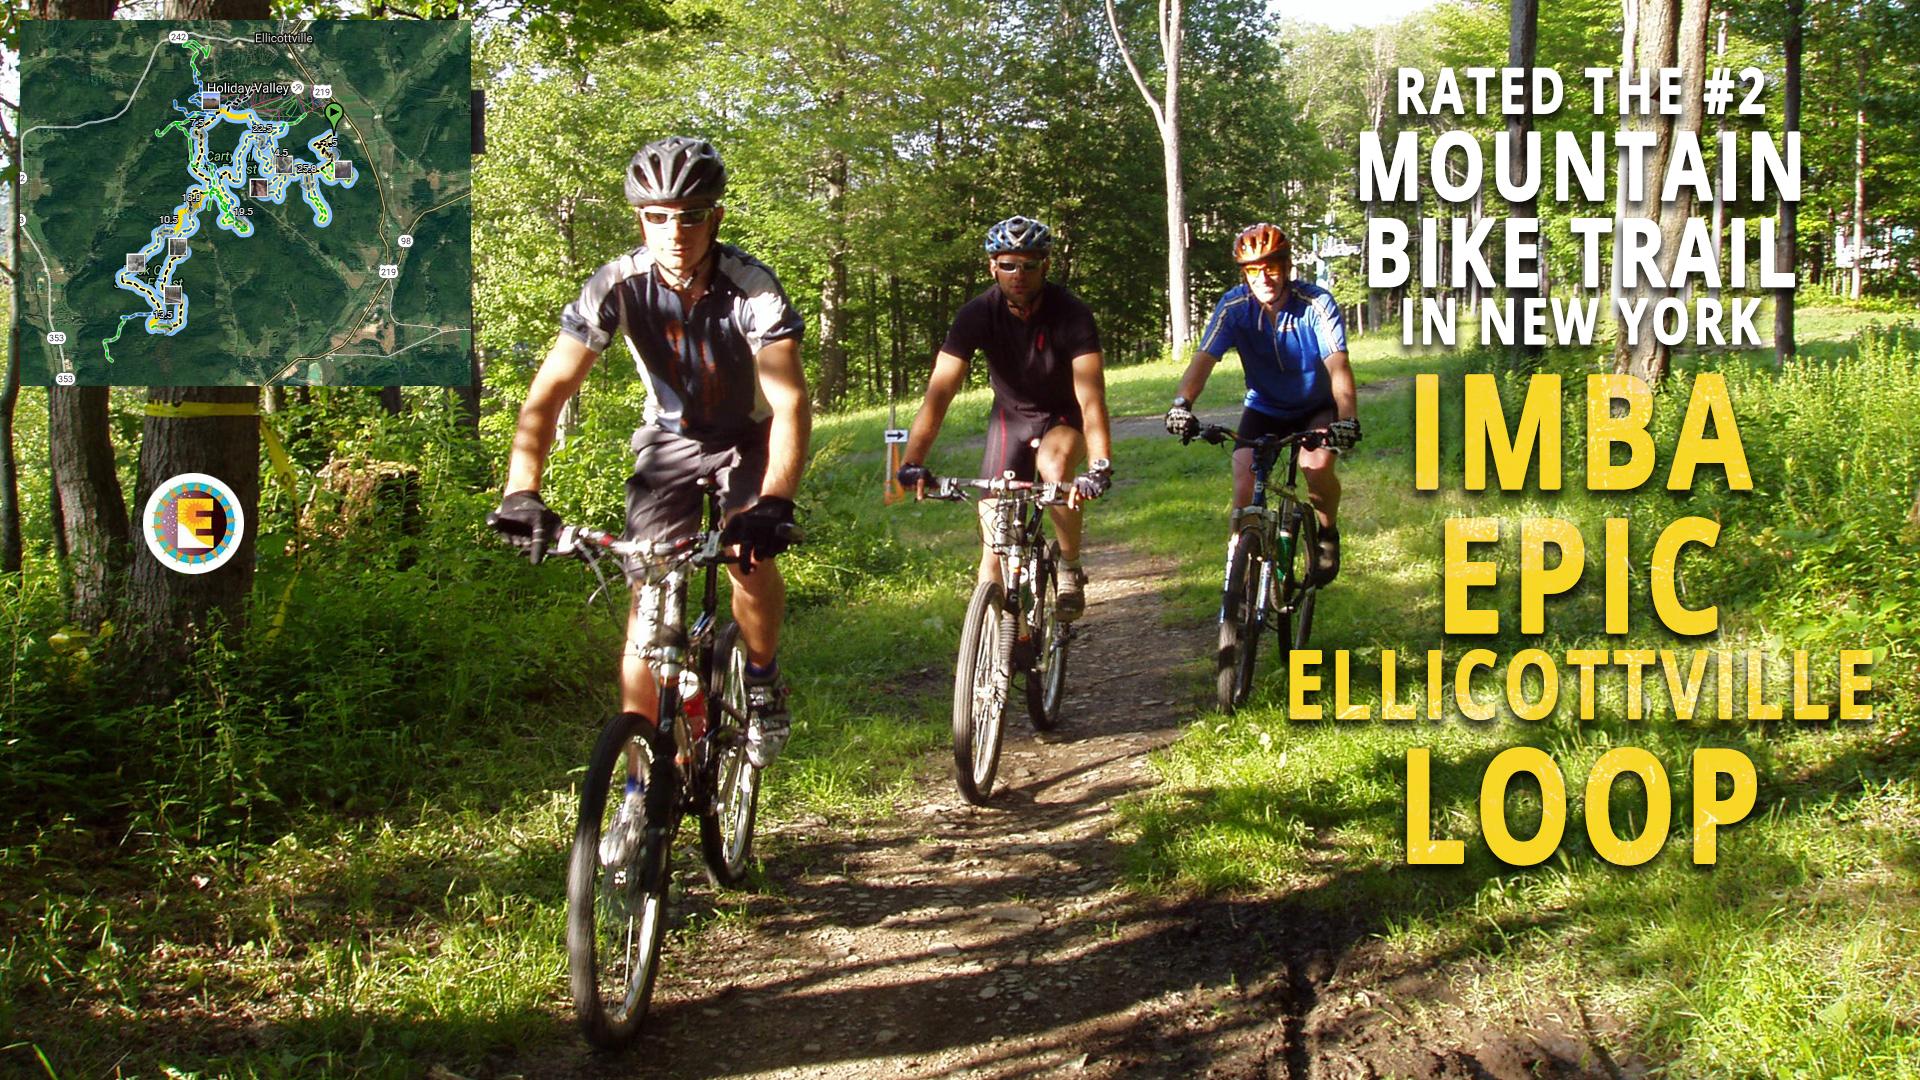 IMBA Epic Ellicottville Loop